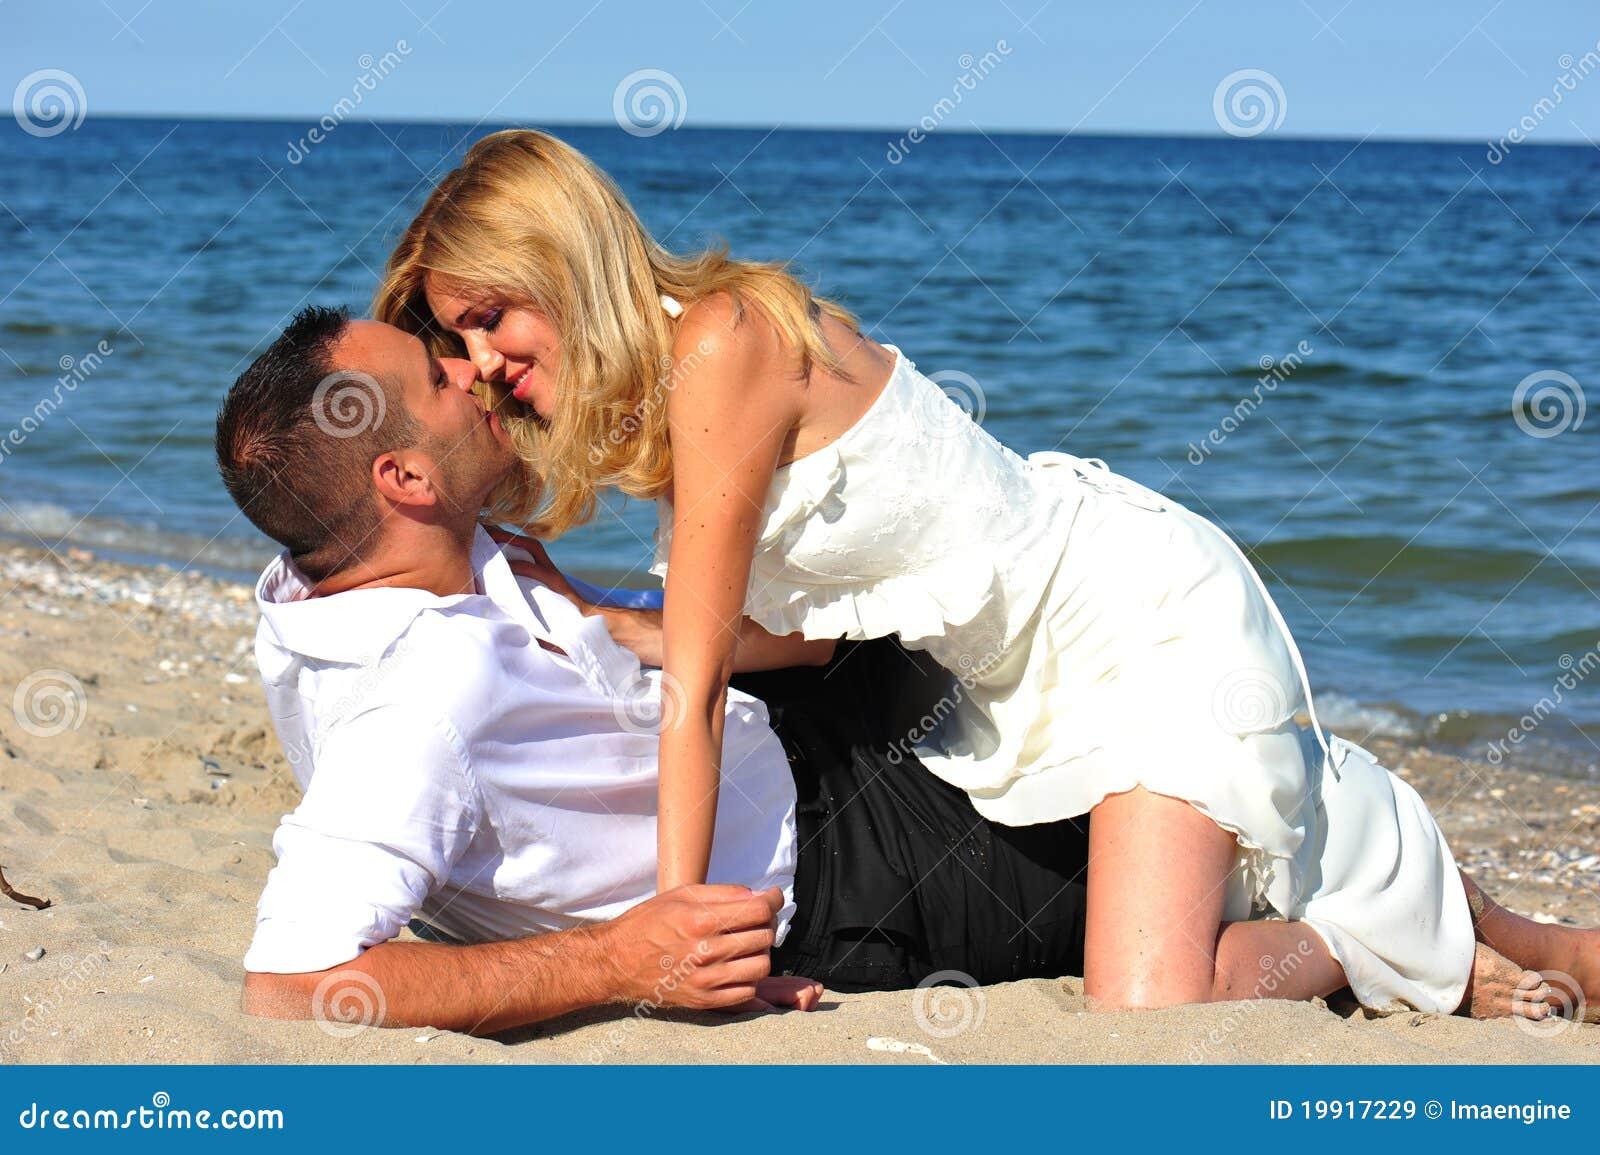 Magical moments - newlyweds kissing